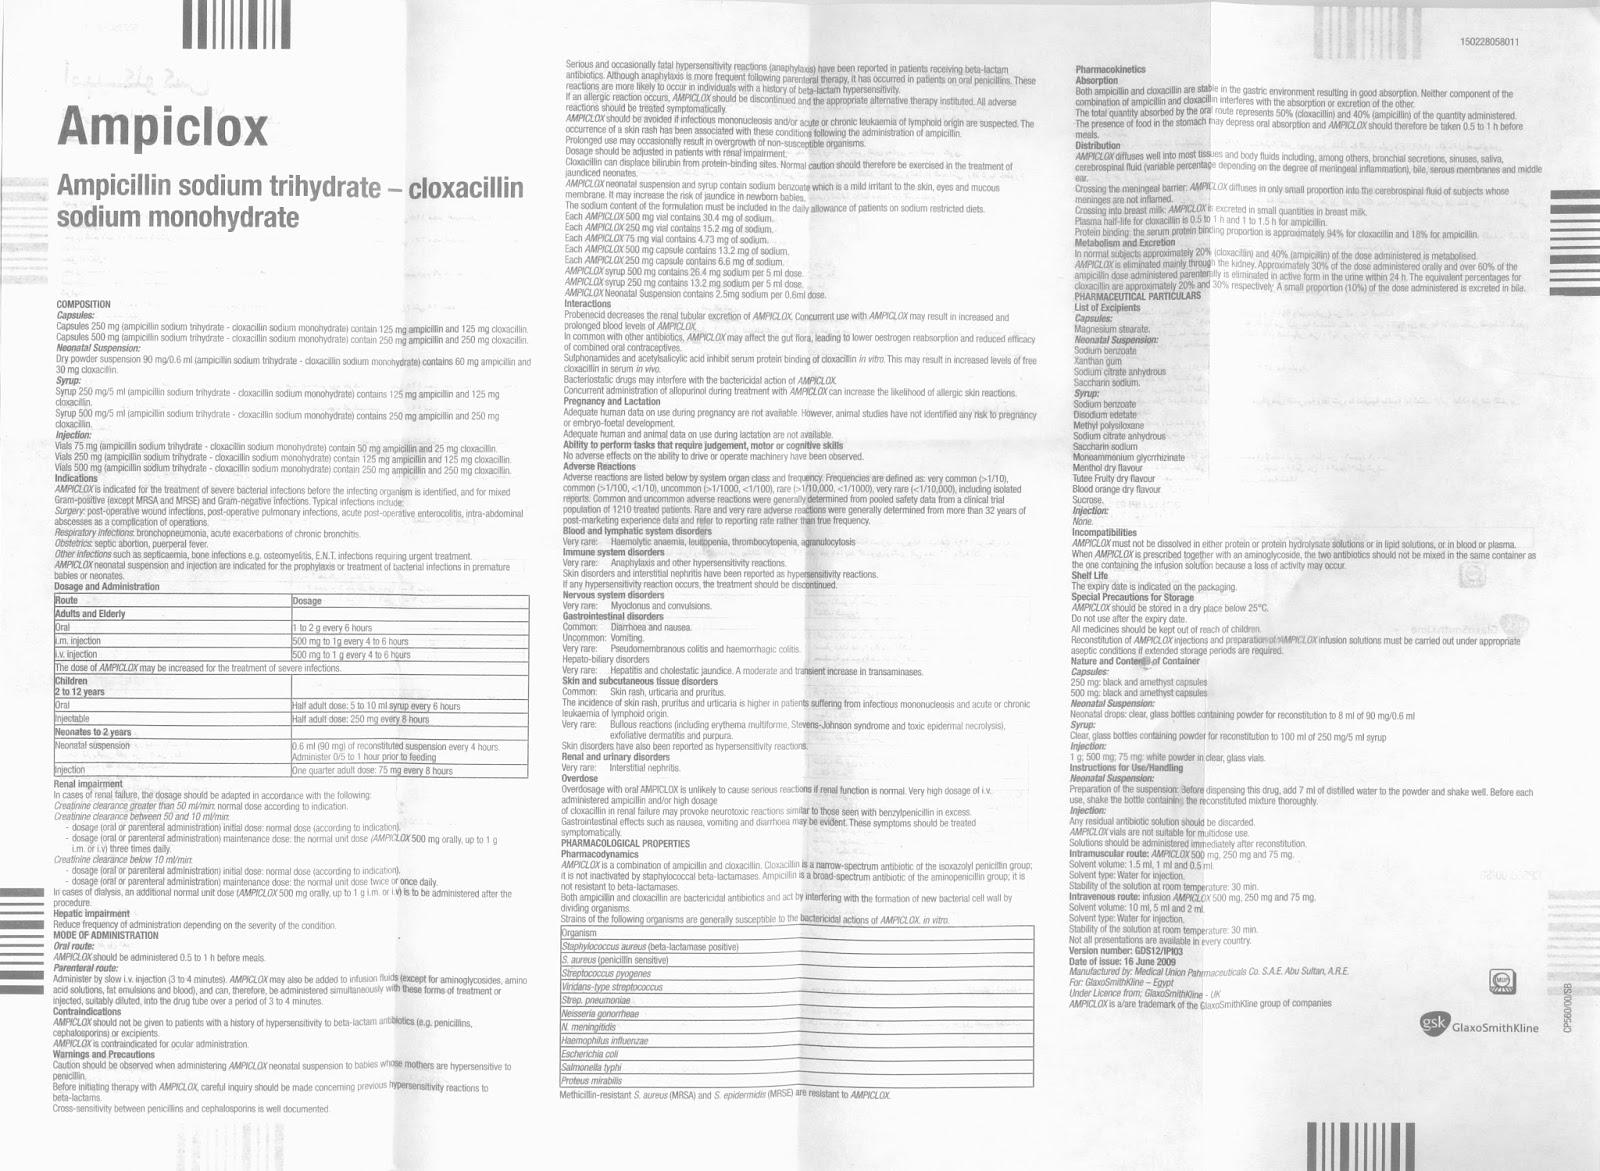 1mg - Online Medicine Store: Buy Medicines Online from ...